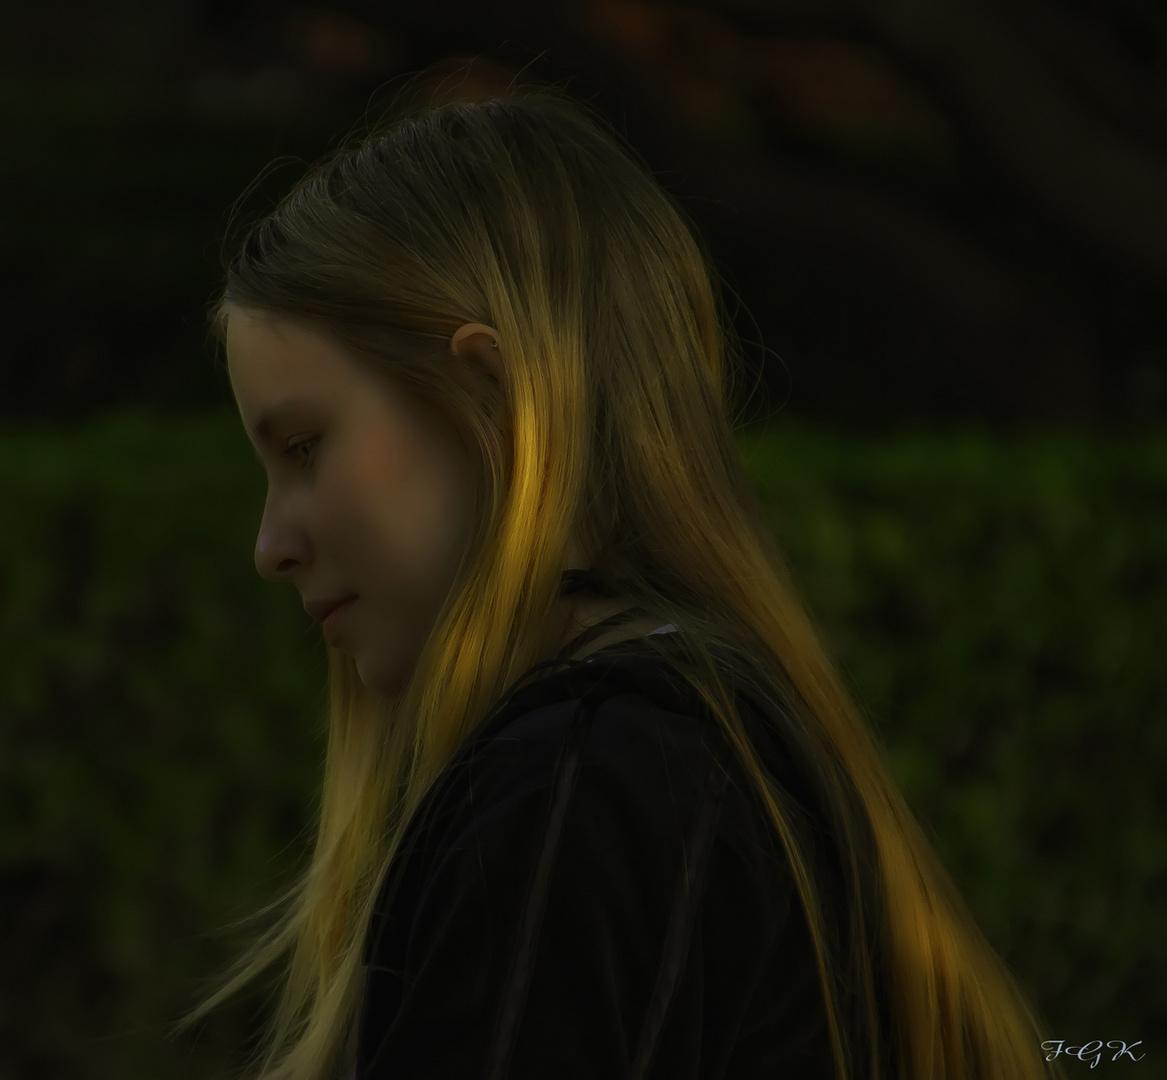 The Elf Girl ( La Muchacha Elfica) a Ana Iglesias